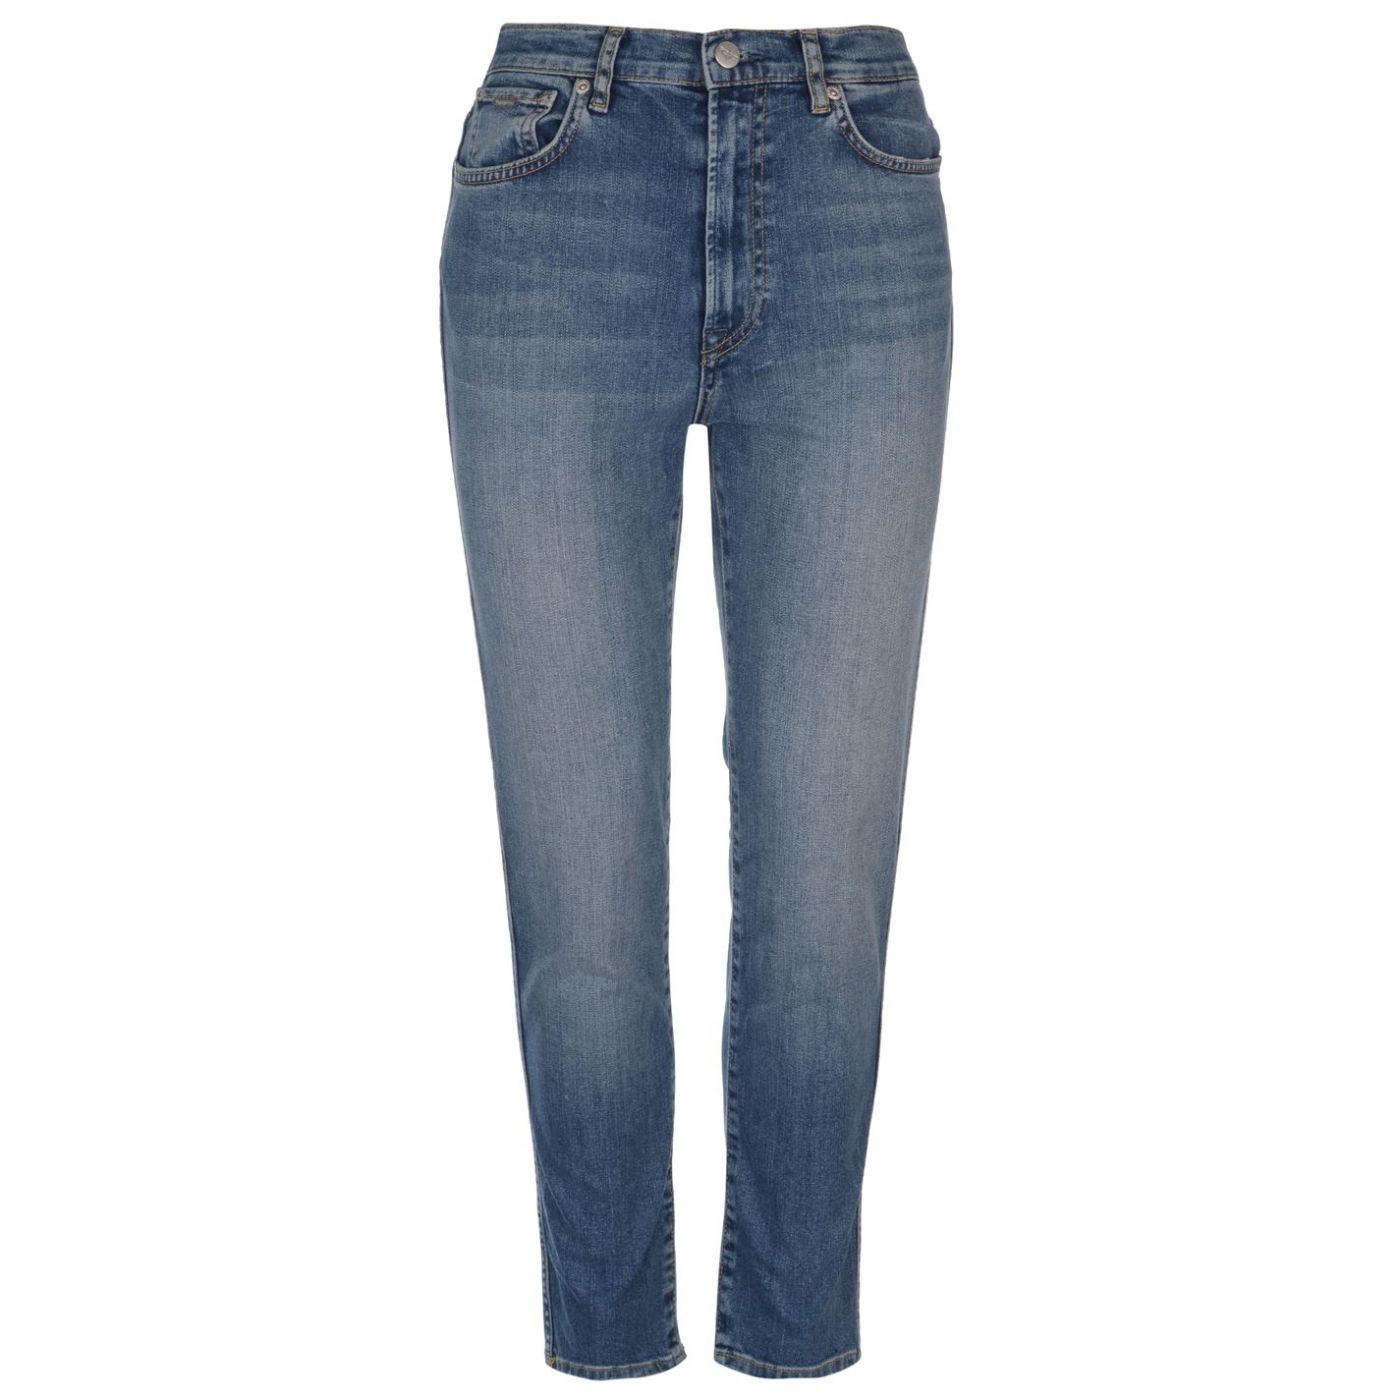 Pepe Jeans Betty High Waist Straight Mom Jeans